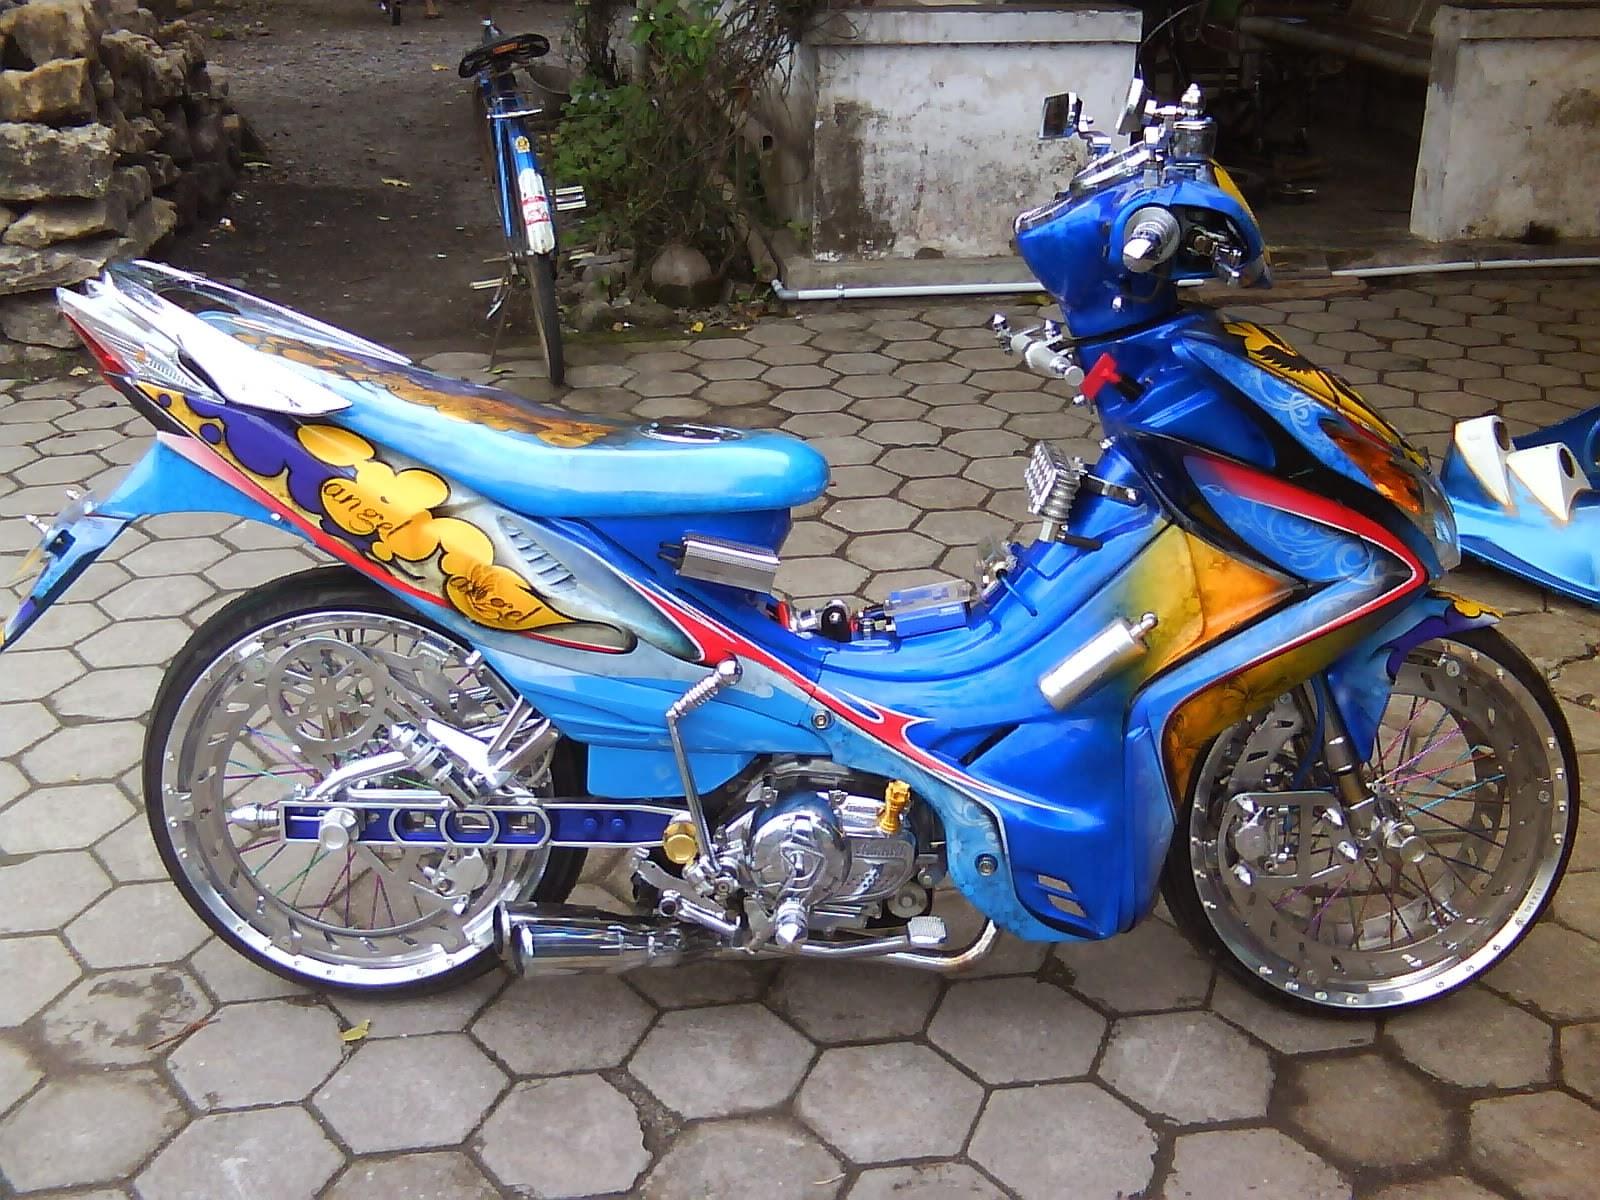 Modifikasi+Motor+Yamaha+Jupiter+Z+04 Perbedaan SUKA, SAYANG dan CINTA by Soalremaja.Com